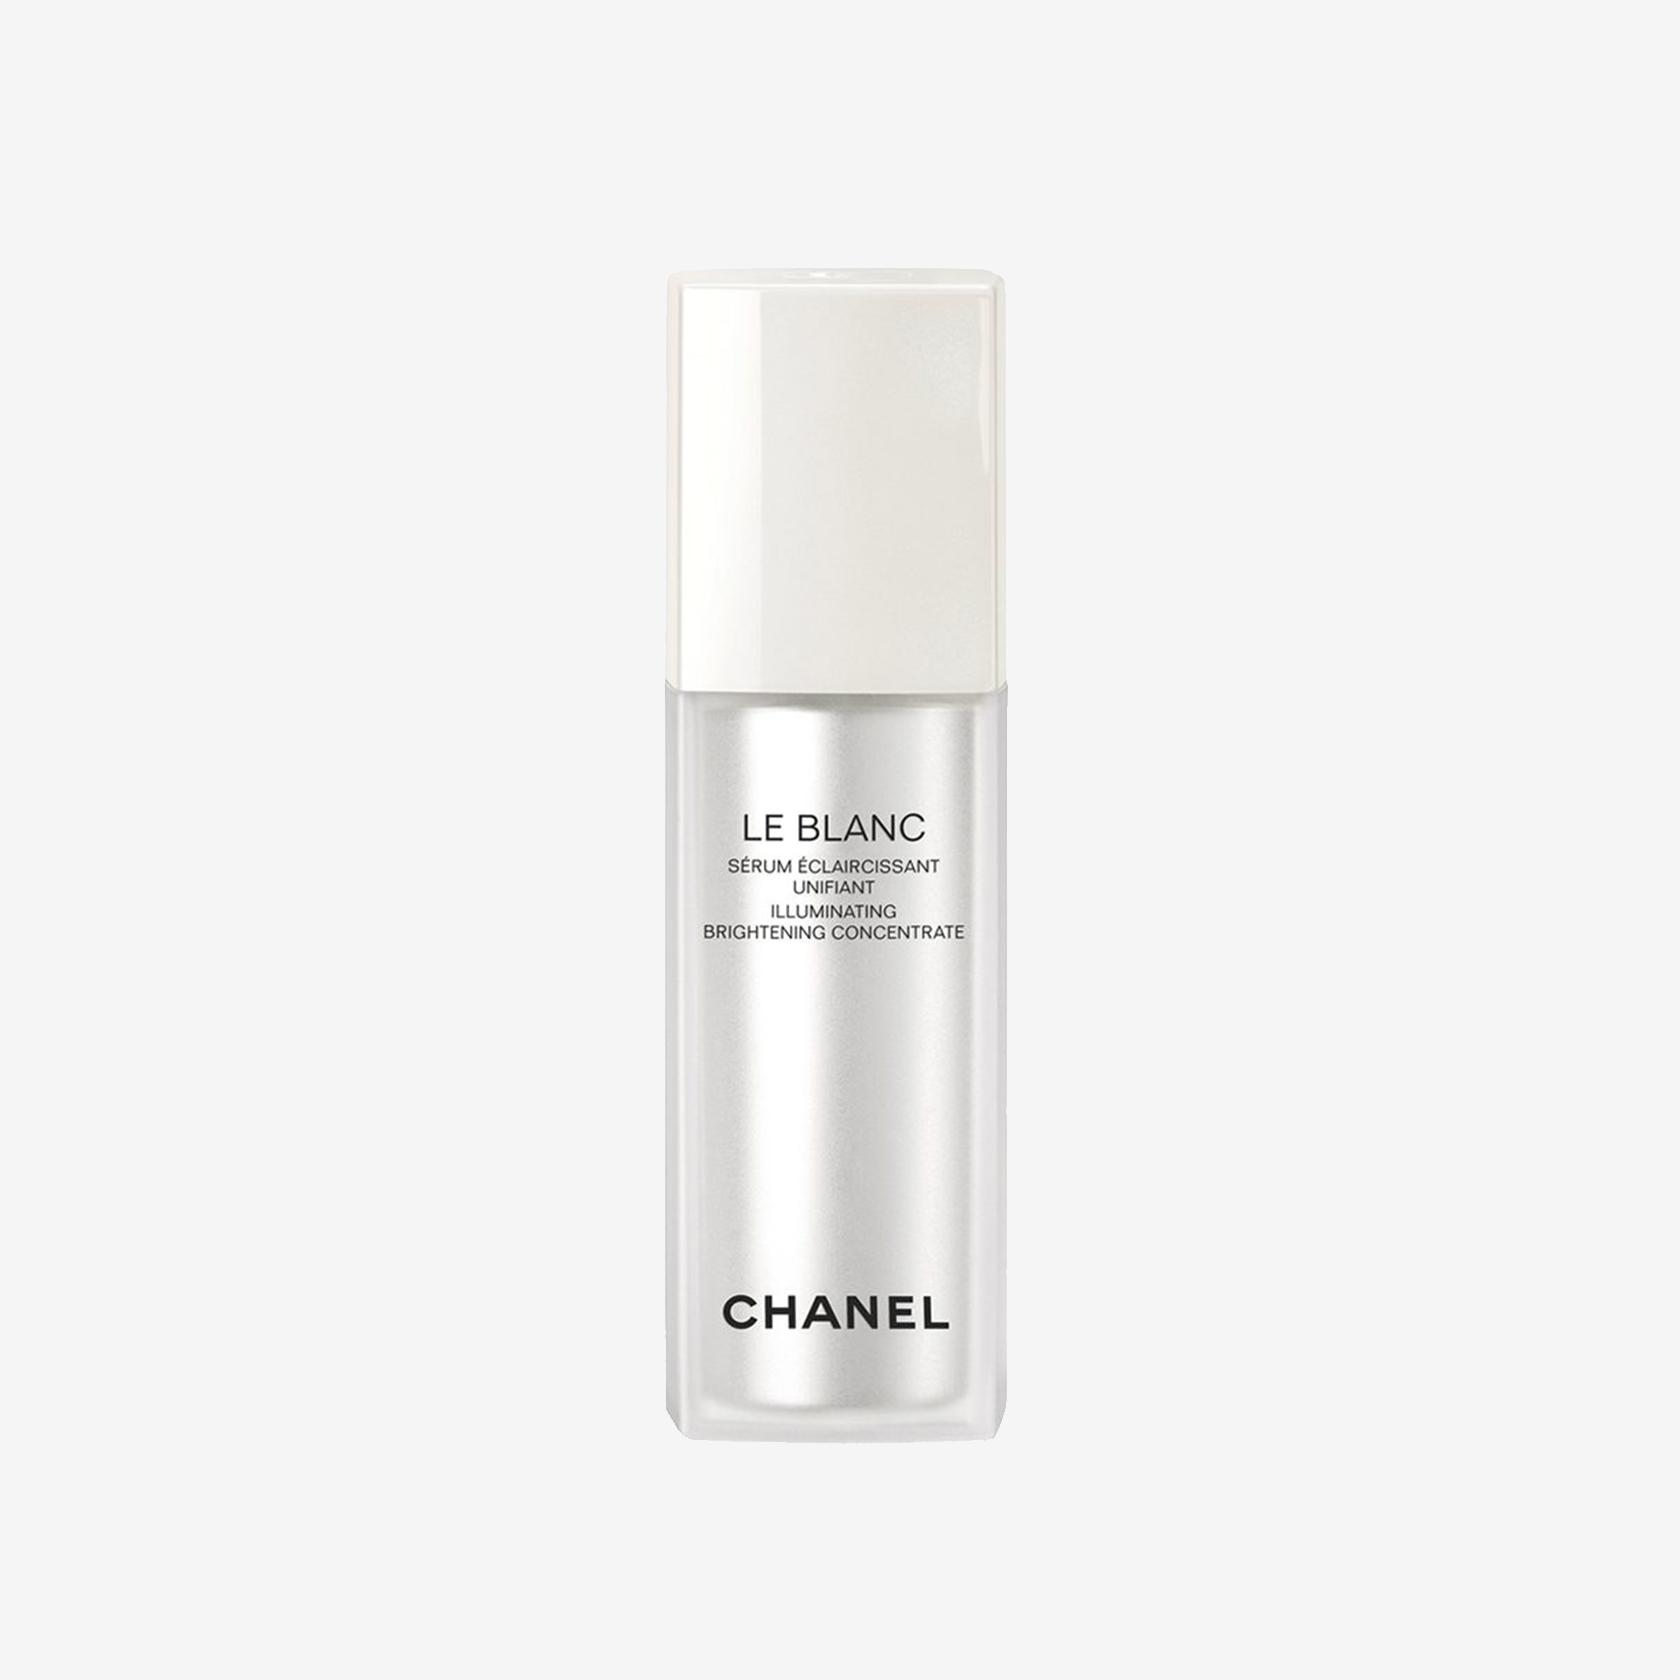 Сыворотка для борьбы с пигментацией Illuminating Brightening Concentrate, Le Blanc, Chanel